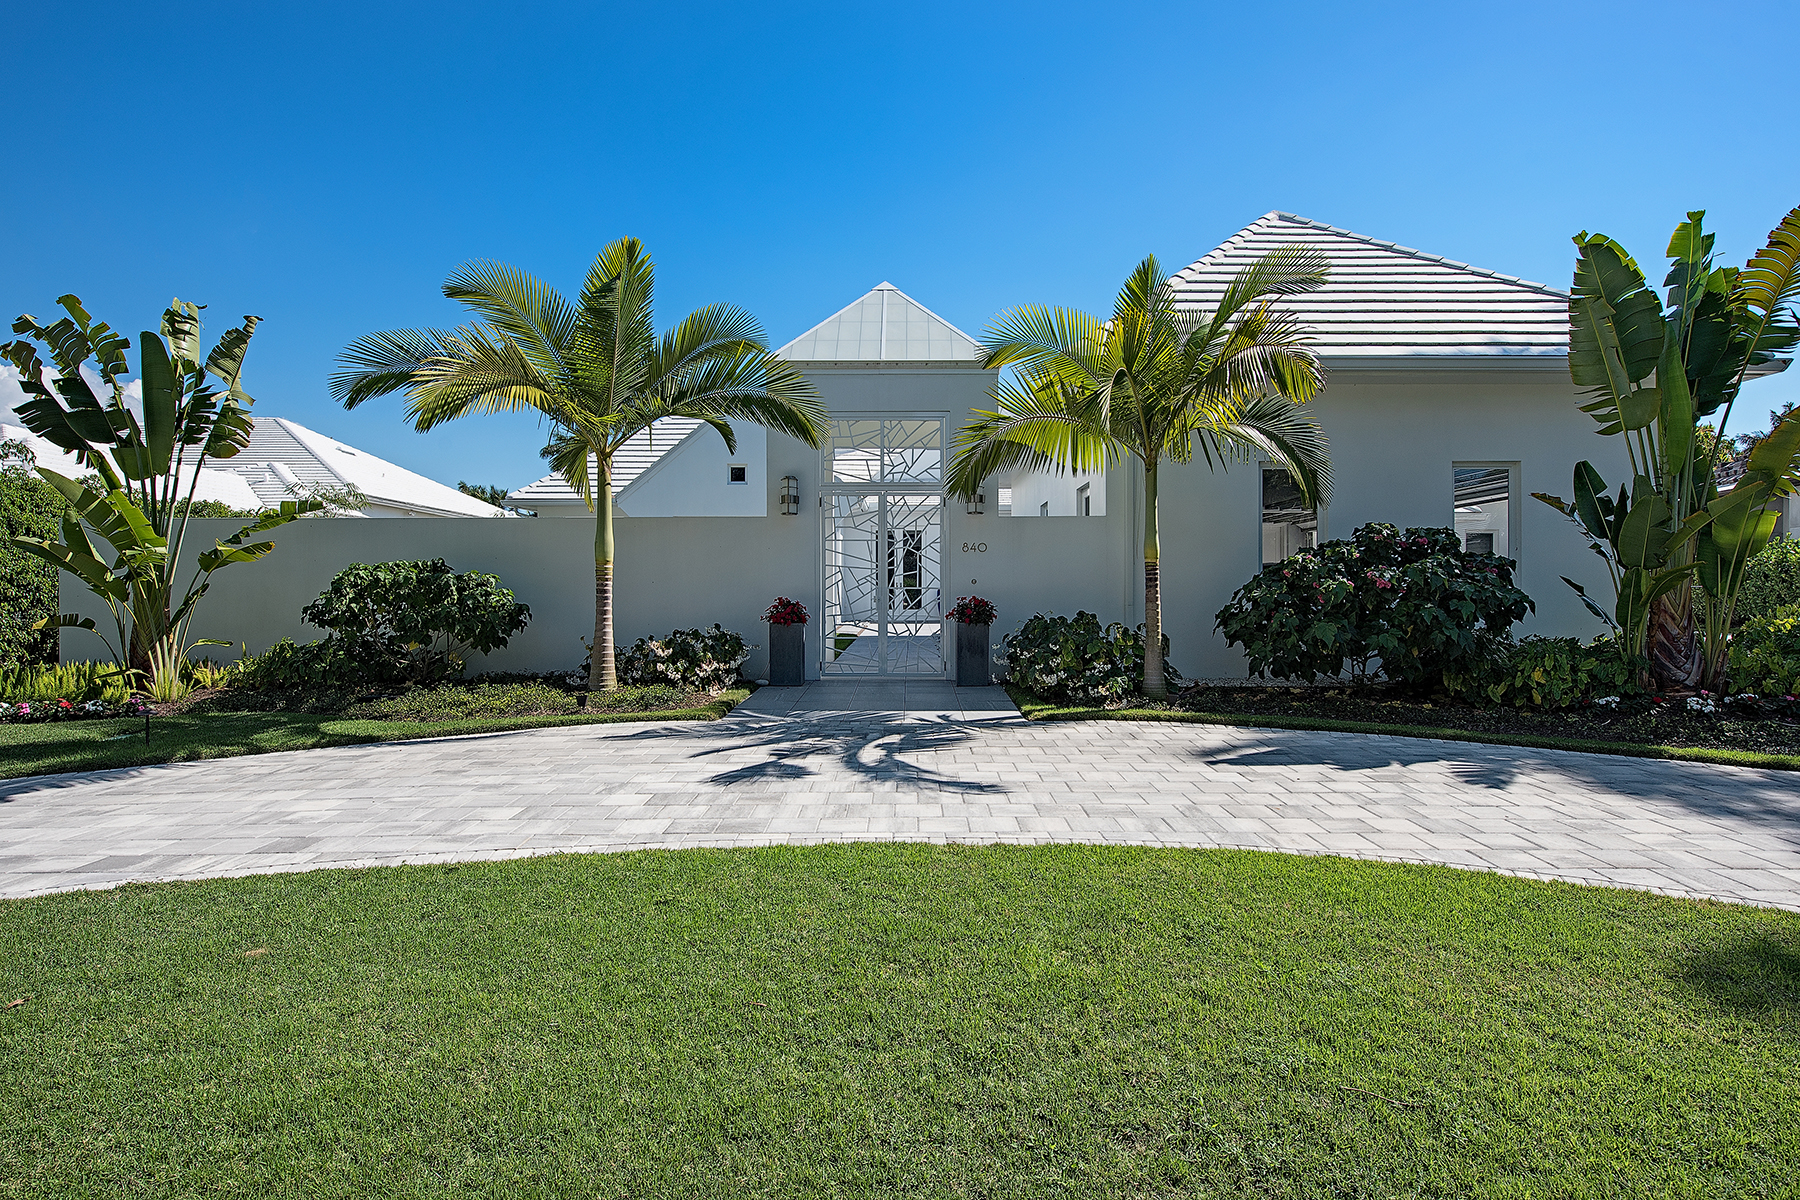 واحد منزل الأسرة للـ Sale في AQUALANE SHORES 840 17th Ave S, Naples, Florida 34102 United States